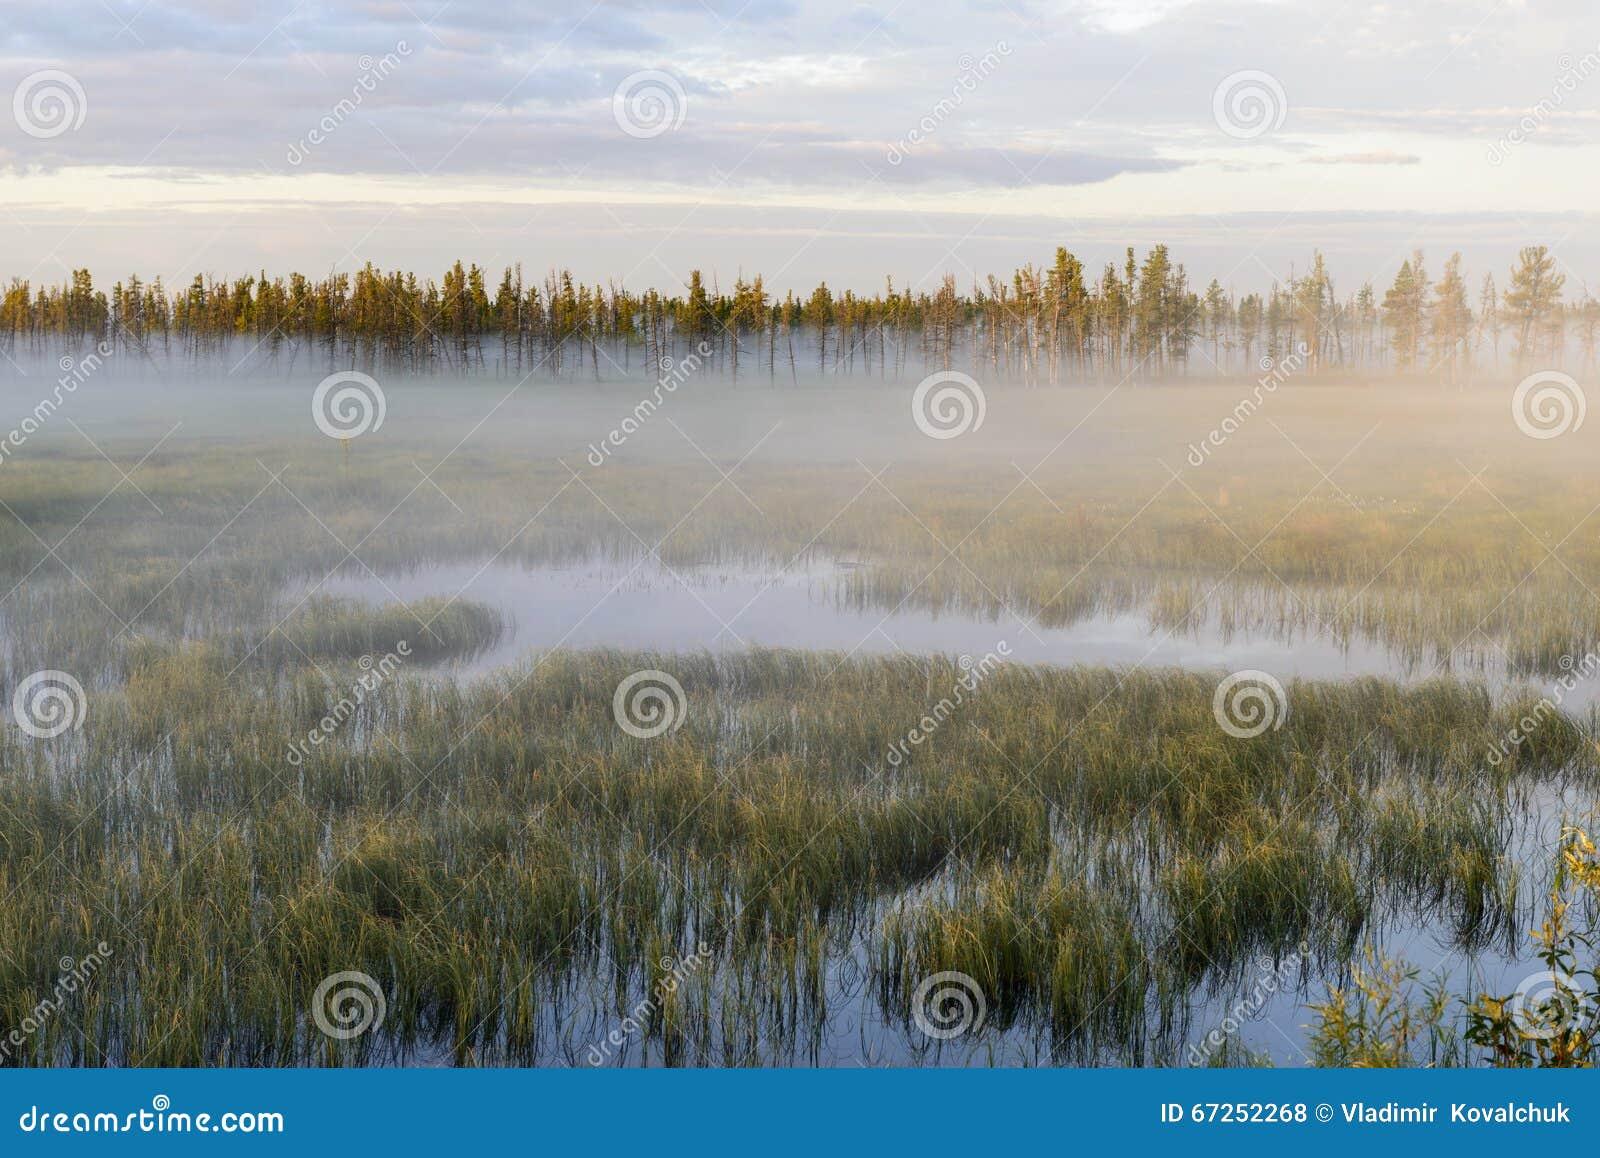 Sunrise On Bogs Royalty-Free Stock Image   CartoonDealer ...